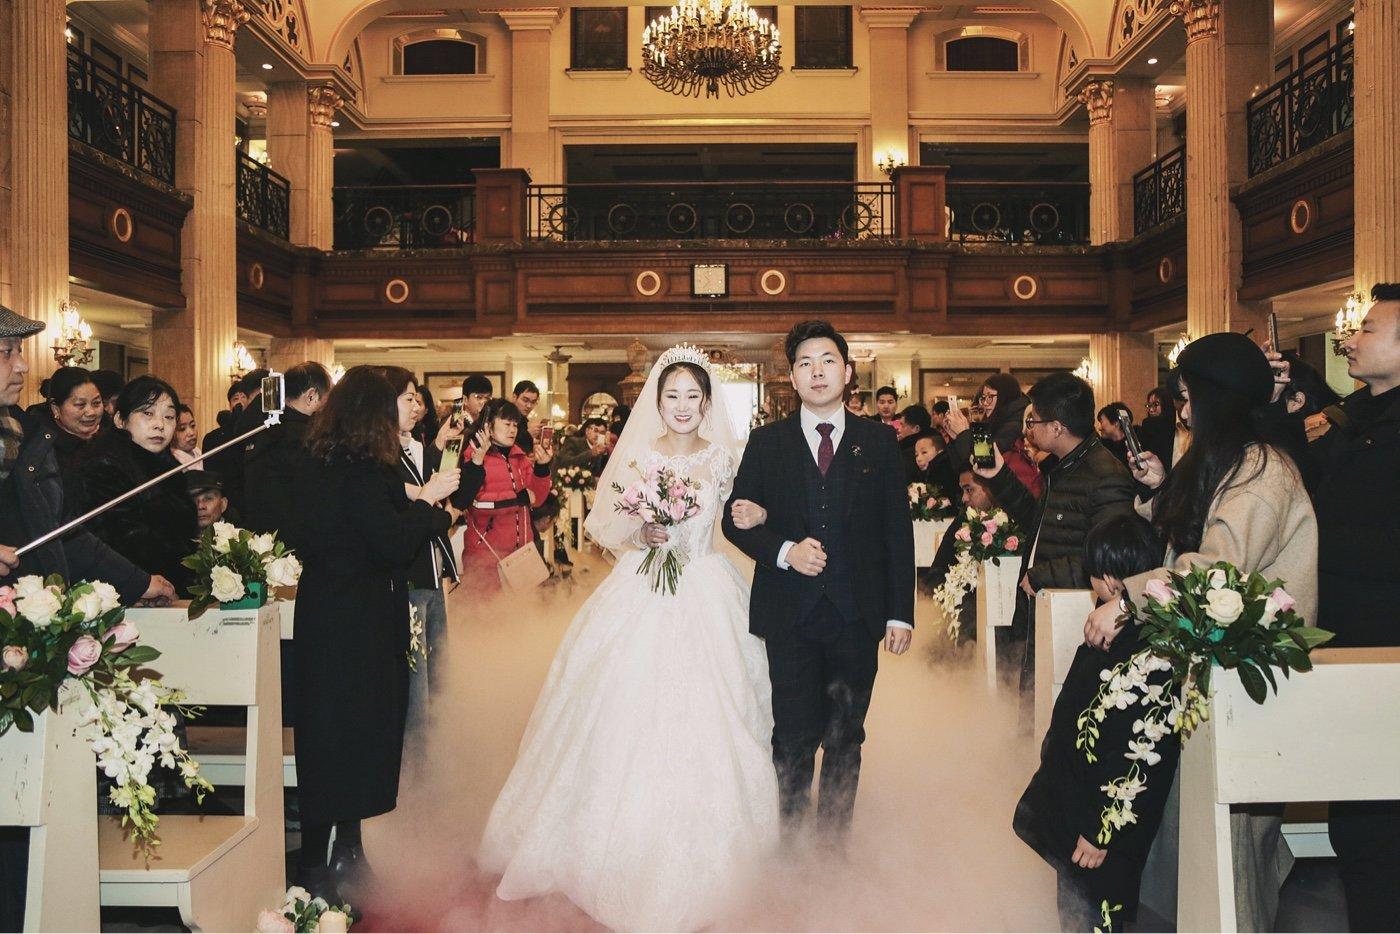 「Fantasy Wedding」&明珠教堂⛪9